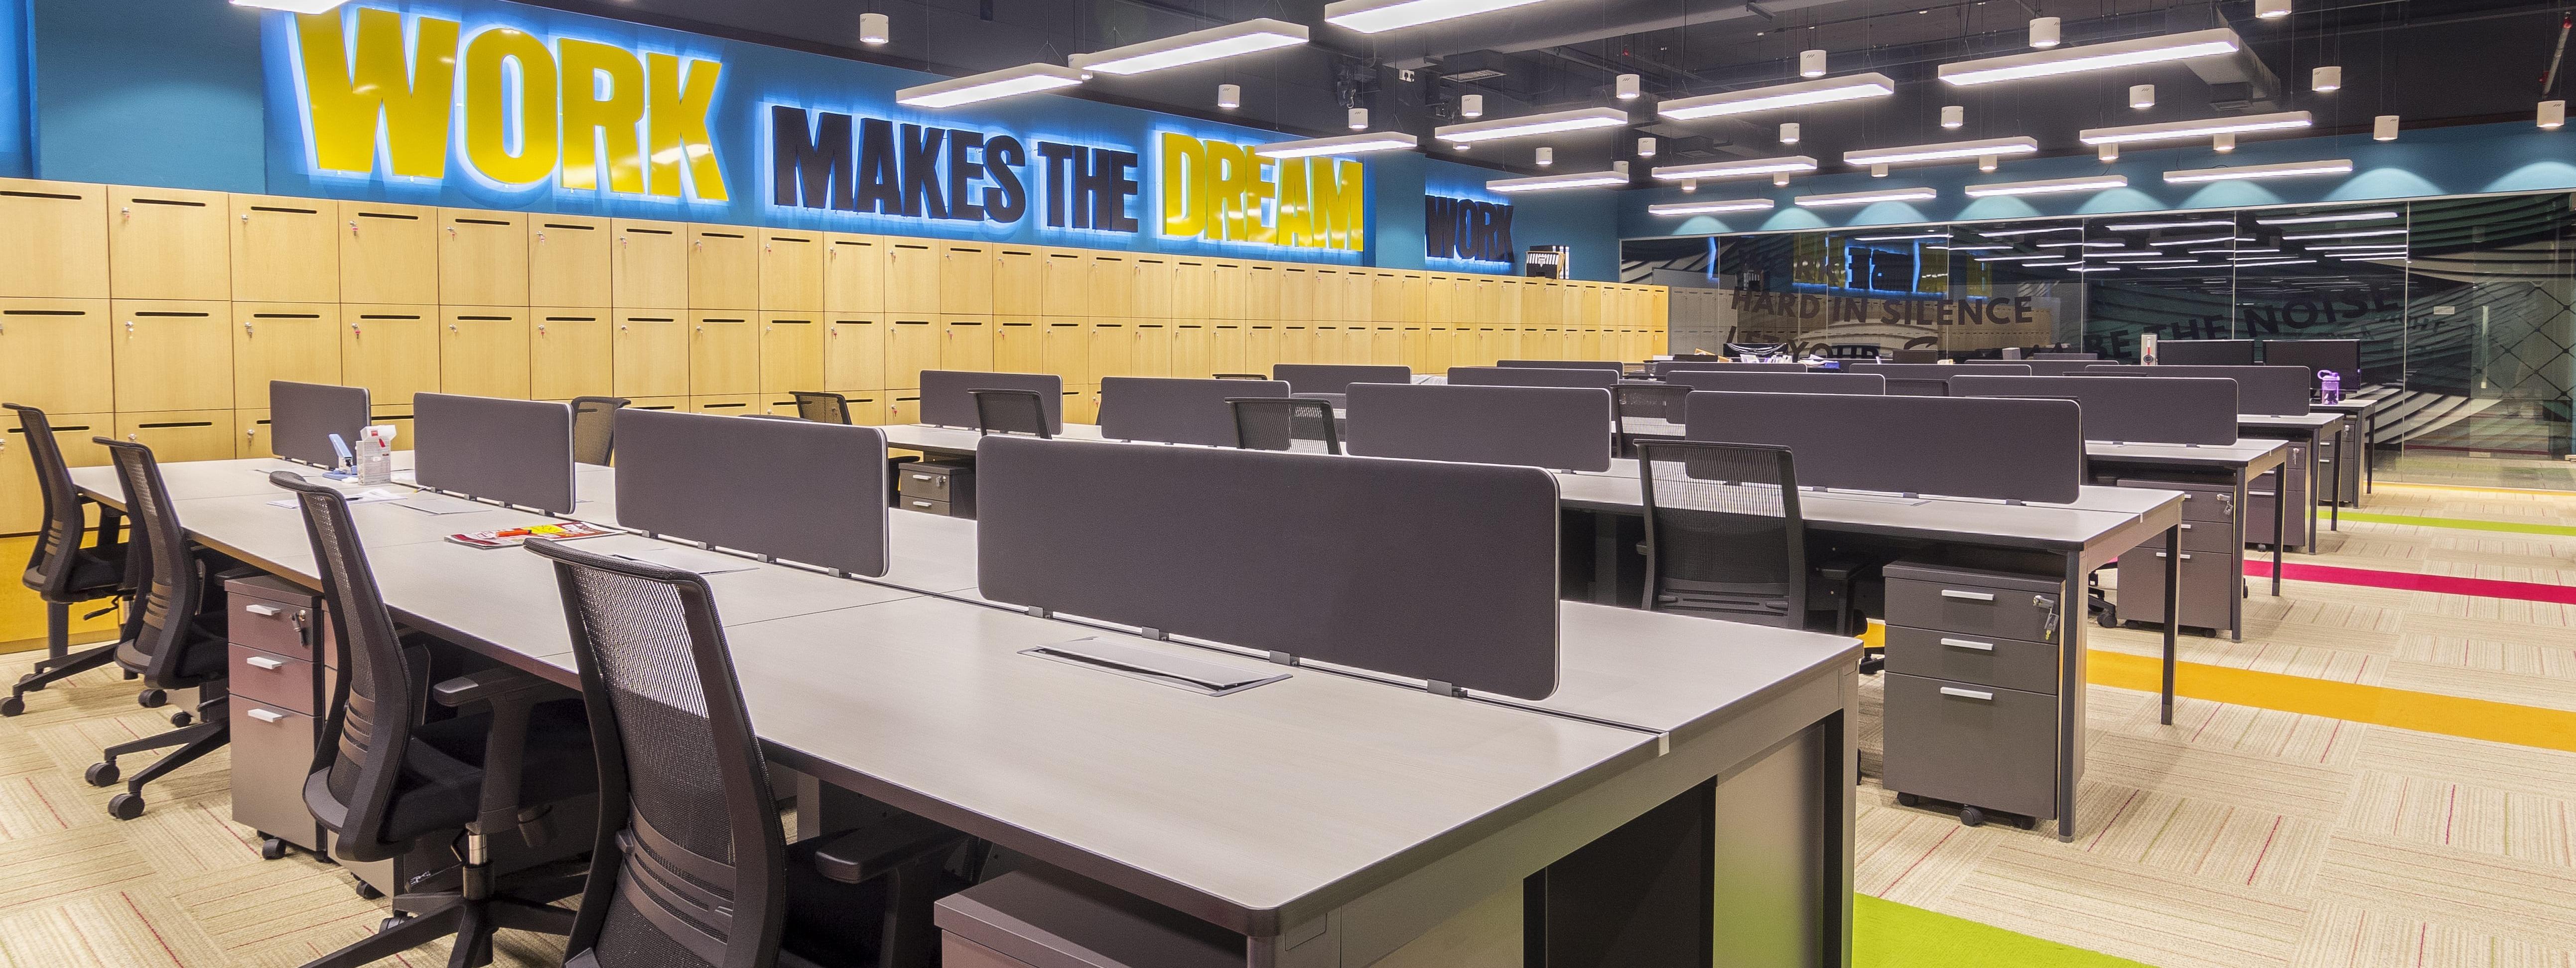 msogo coworking space penang